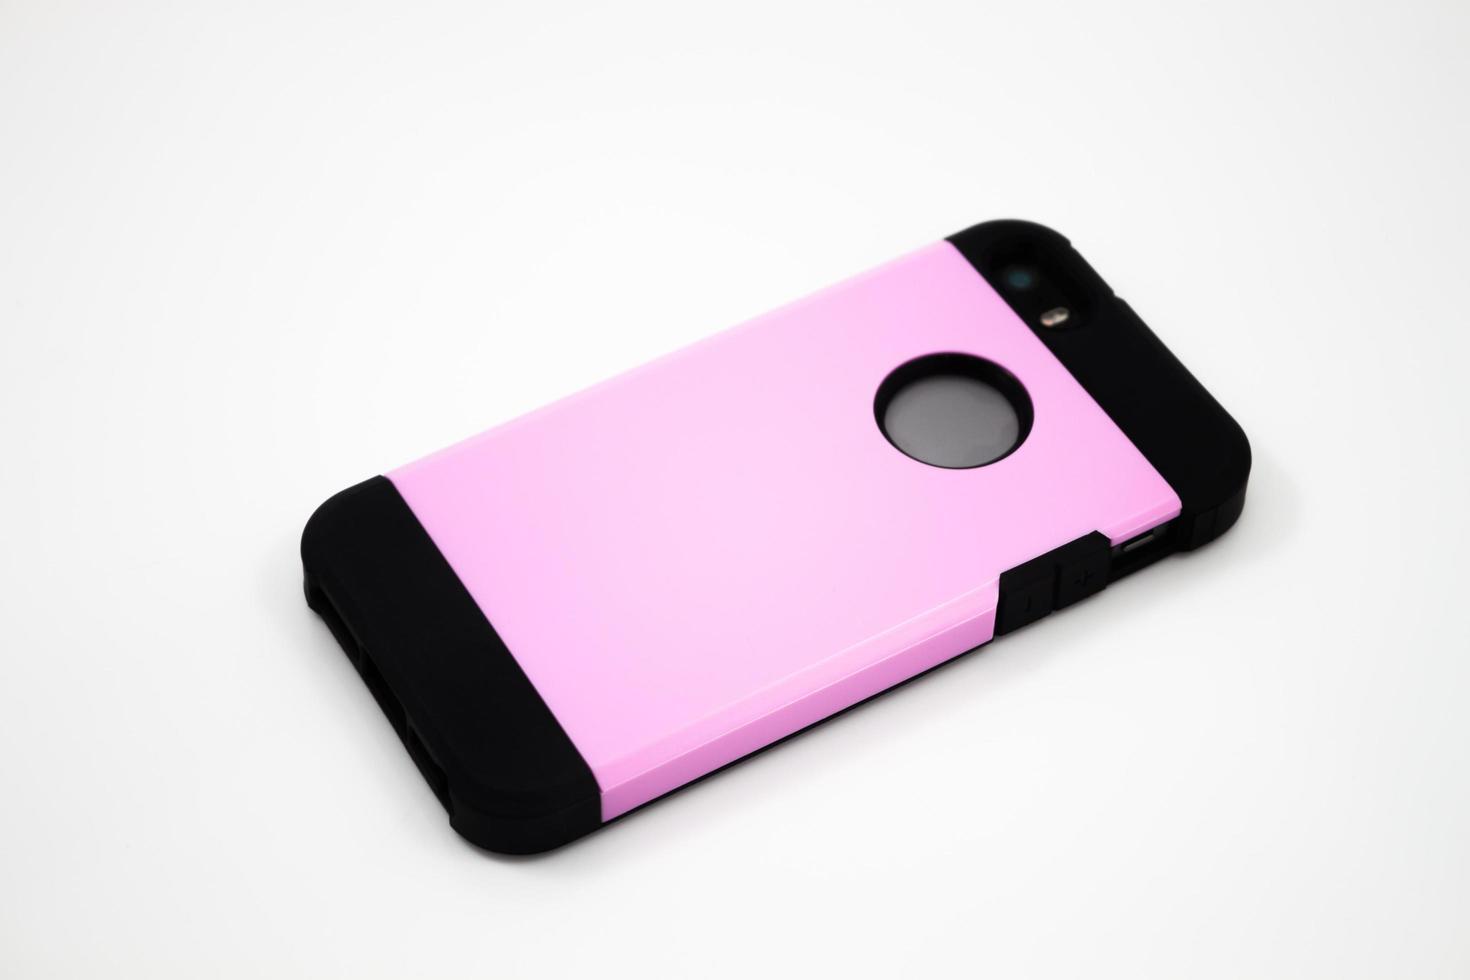 rosa Fall auf einem Smartphone foto